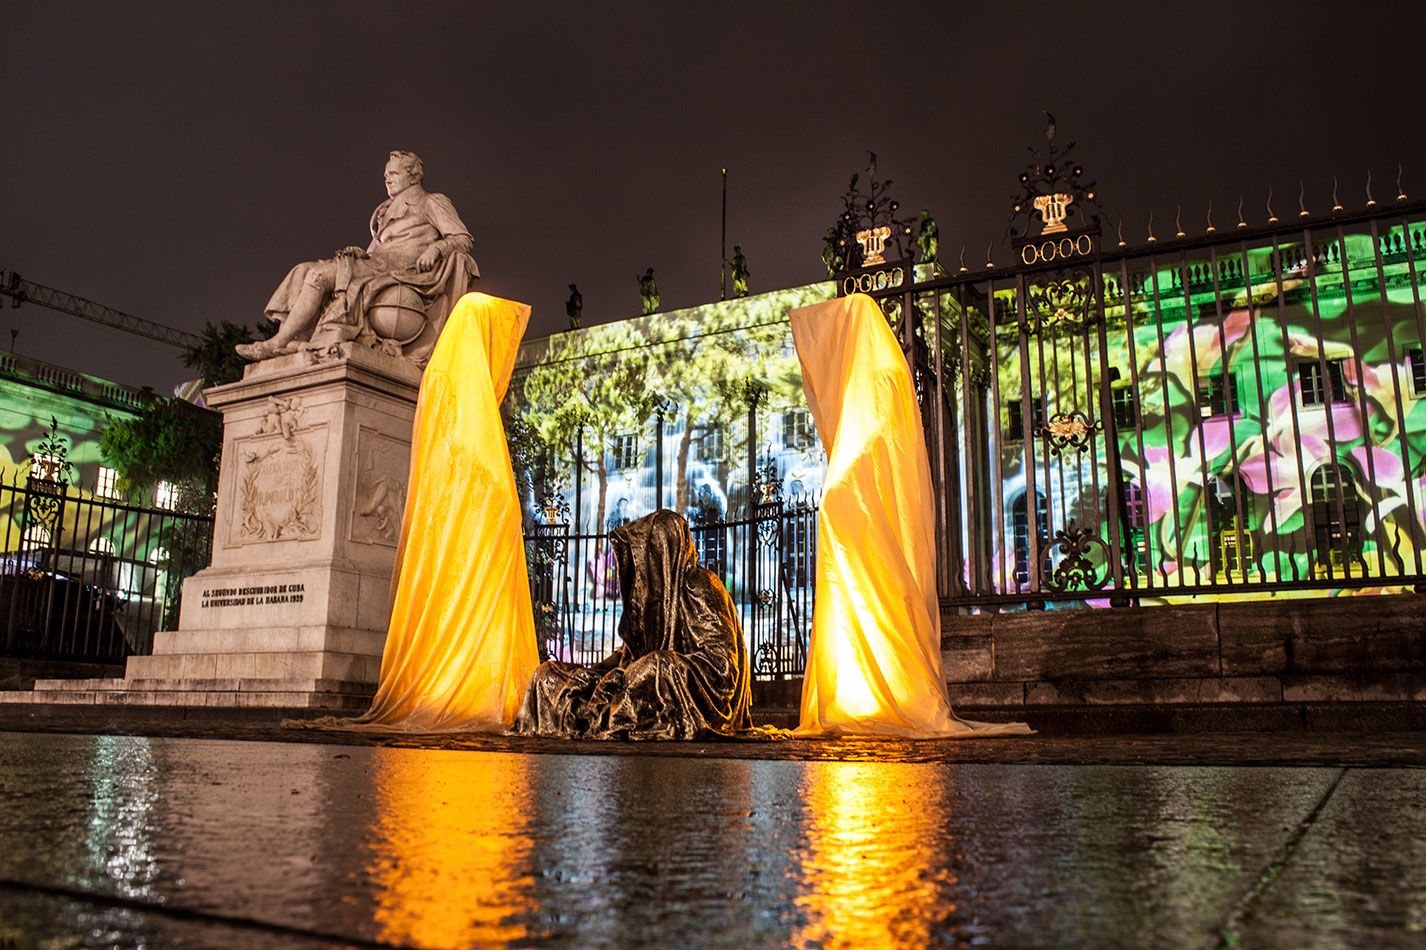 festival-of-lights-berlin-humbold-university-light-art-festival-contemporary-fine-art-design-show-guardiansof-time-manfred-kili-kielnhofer-sculpture-3586